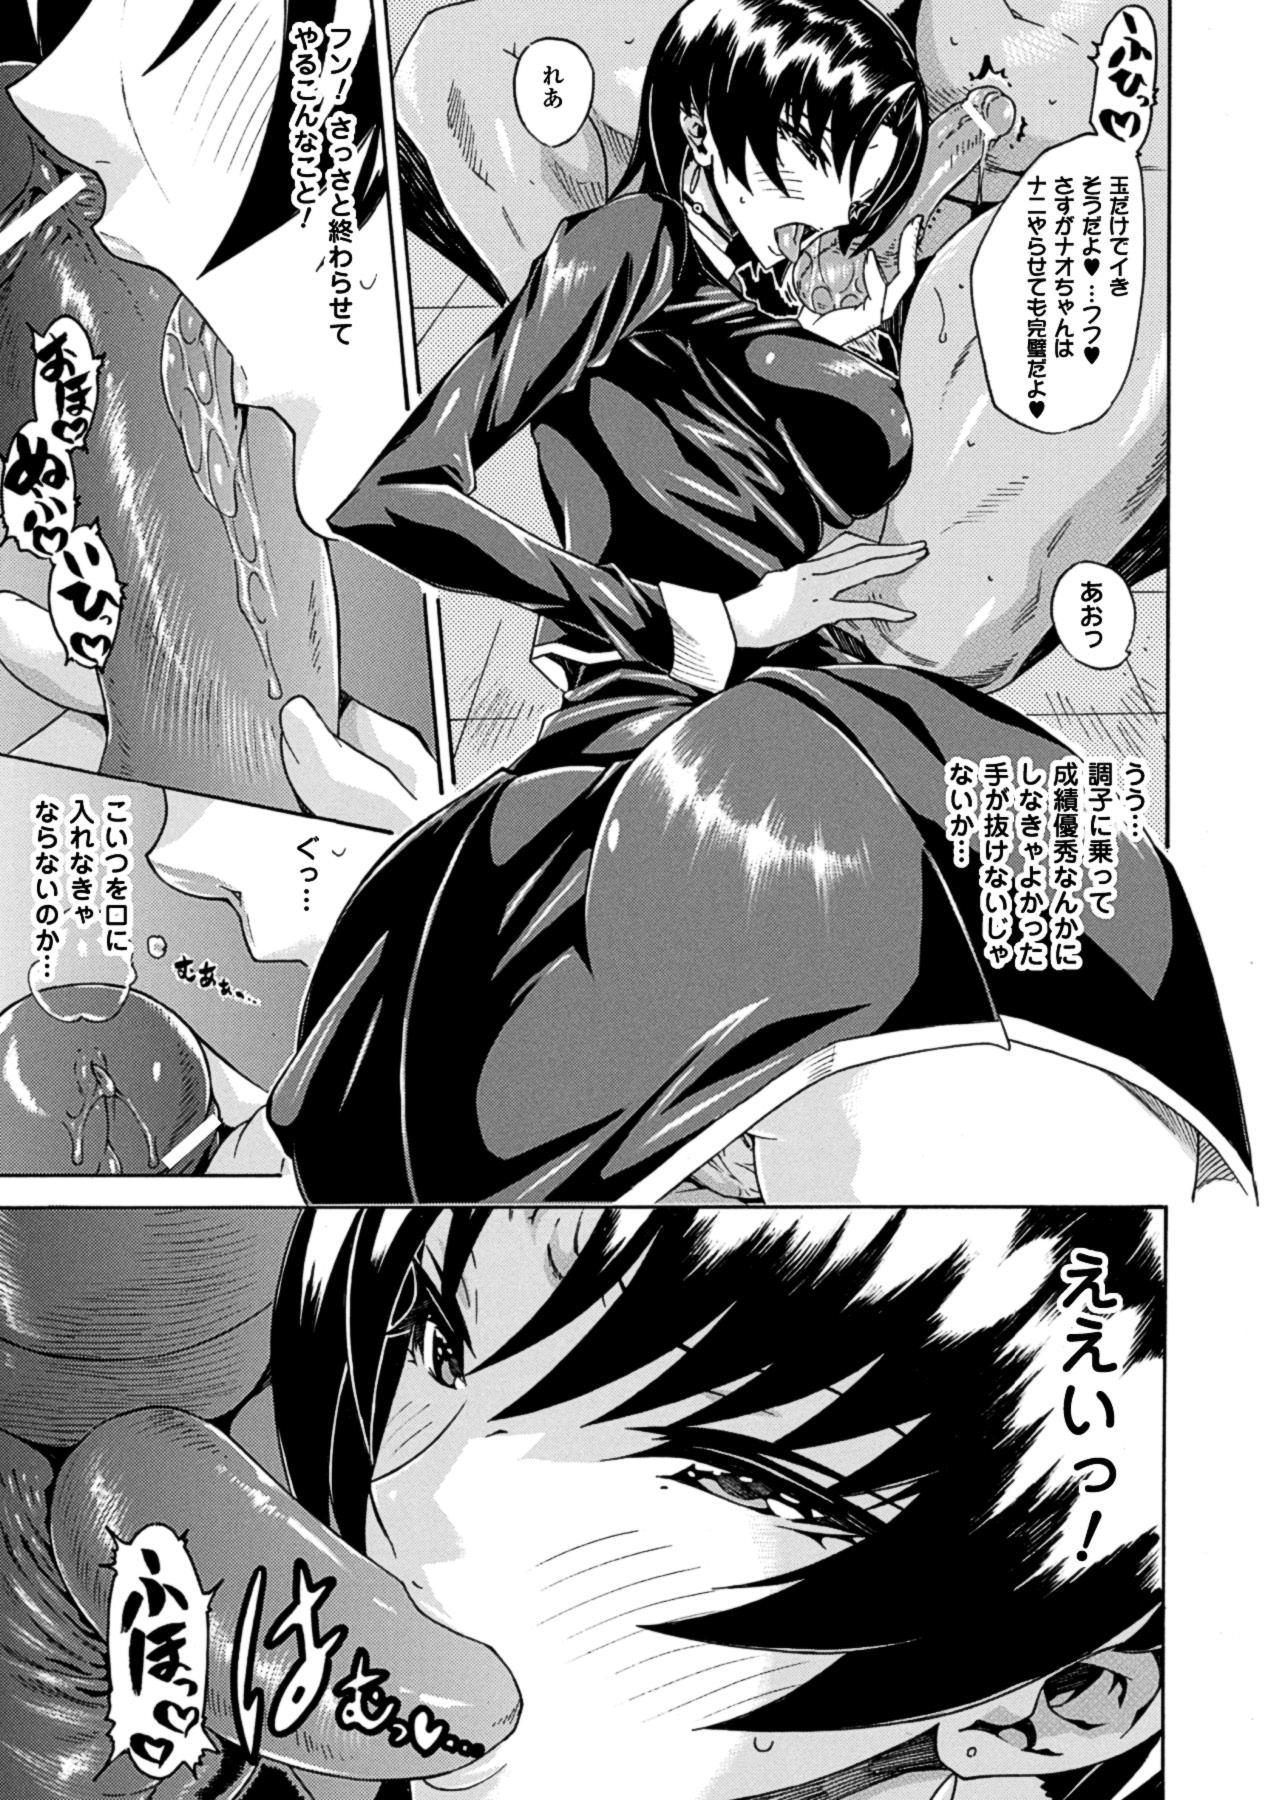 Megami Crisis 10 160